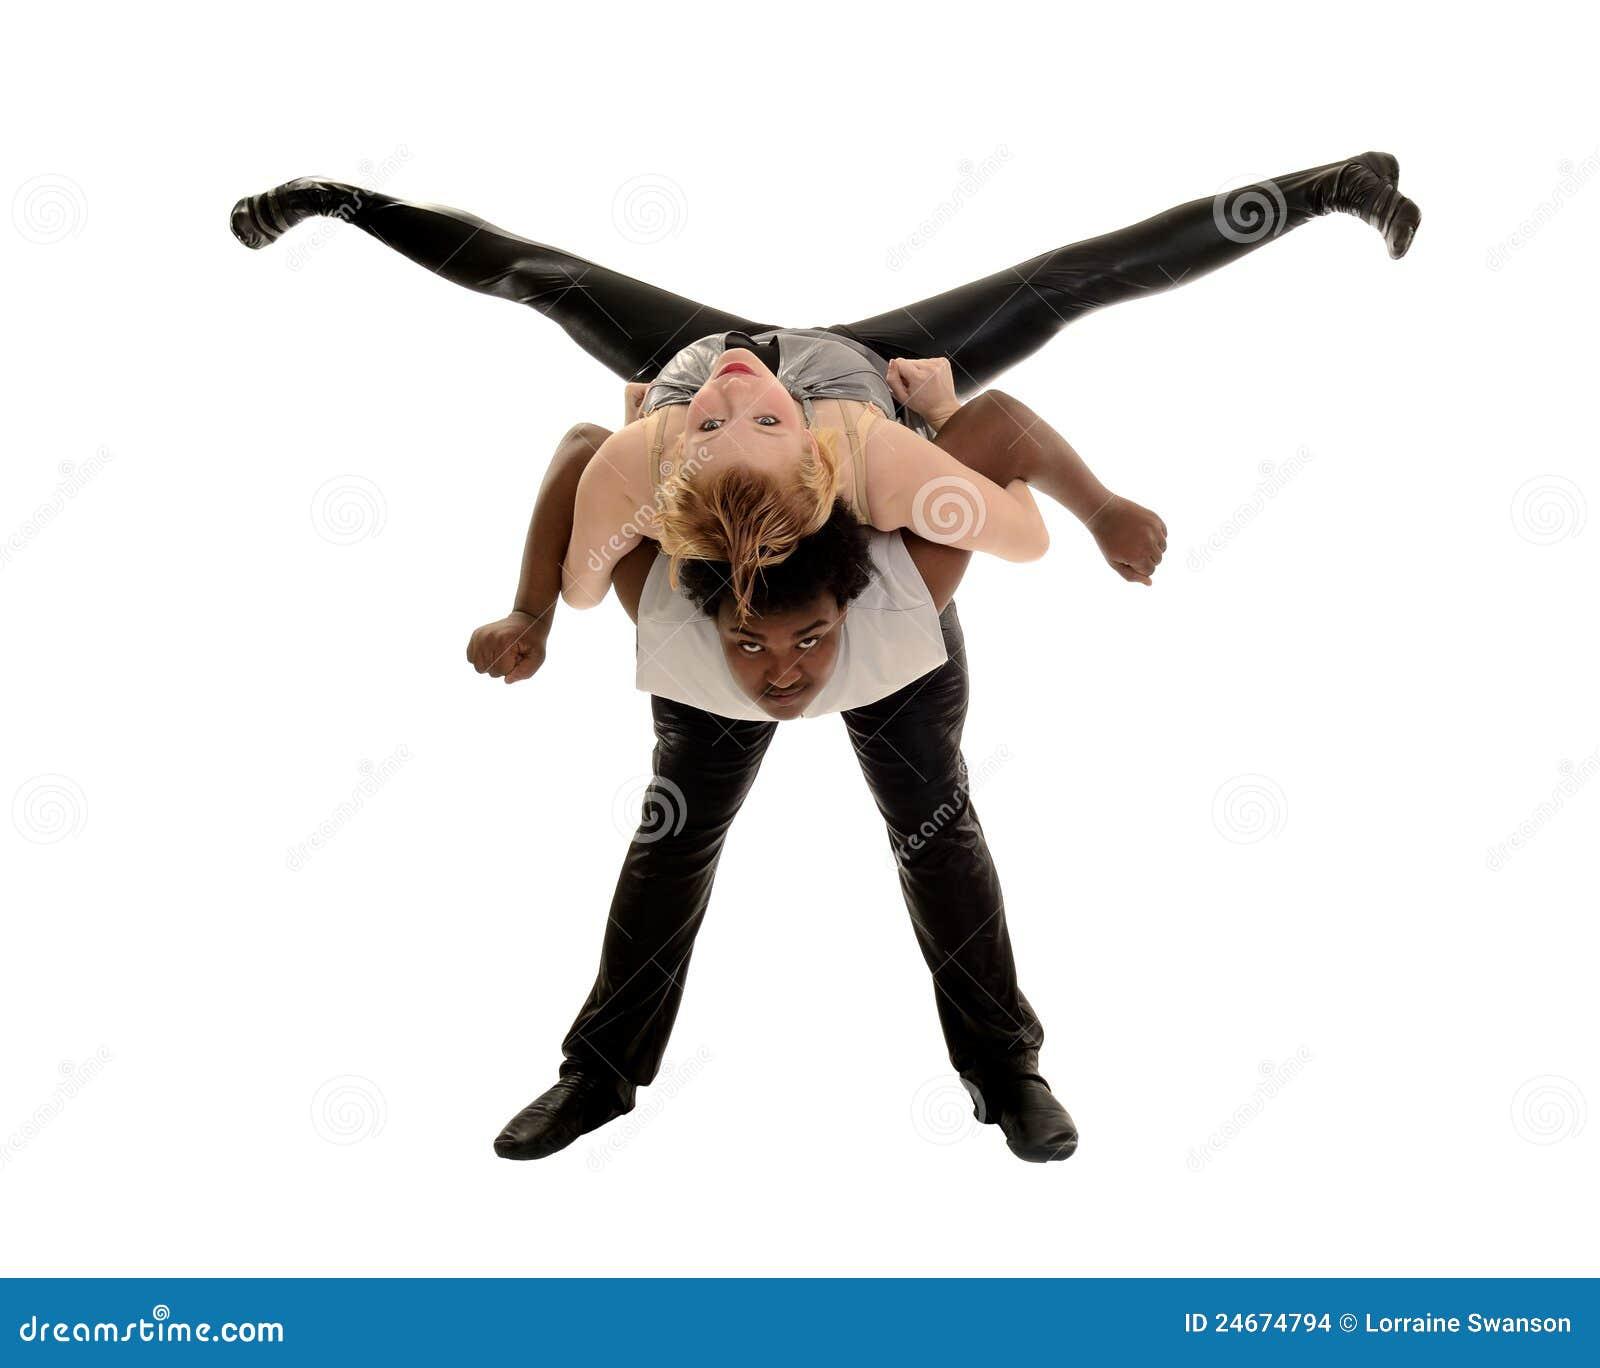 ... Dancer Performing Jazz Dance Lift Stock Images - Image: 24674794